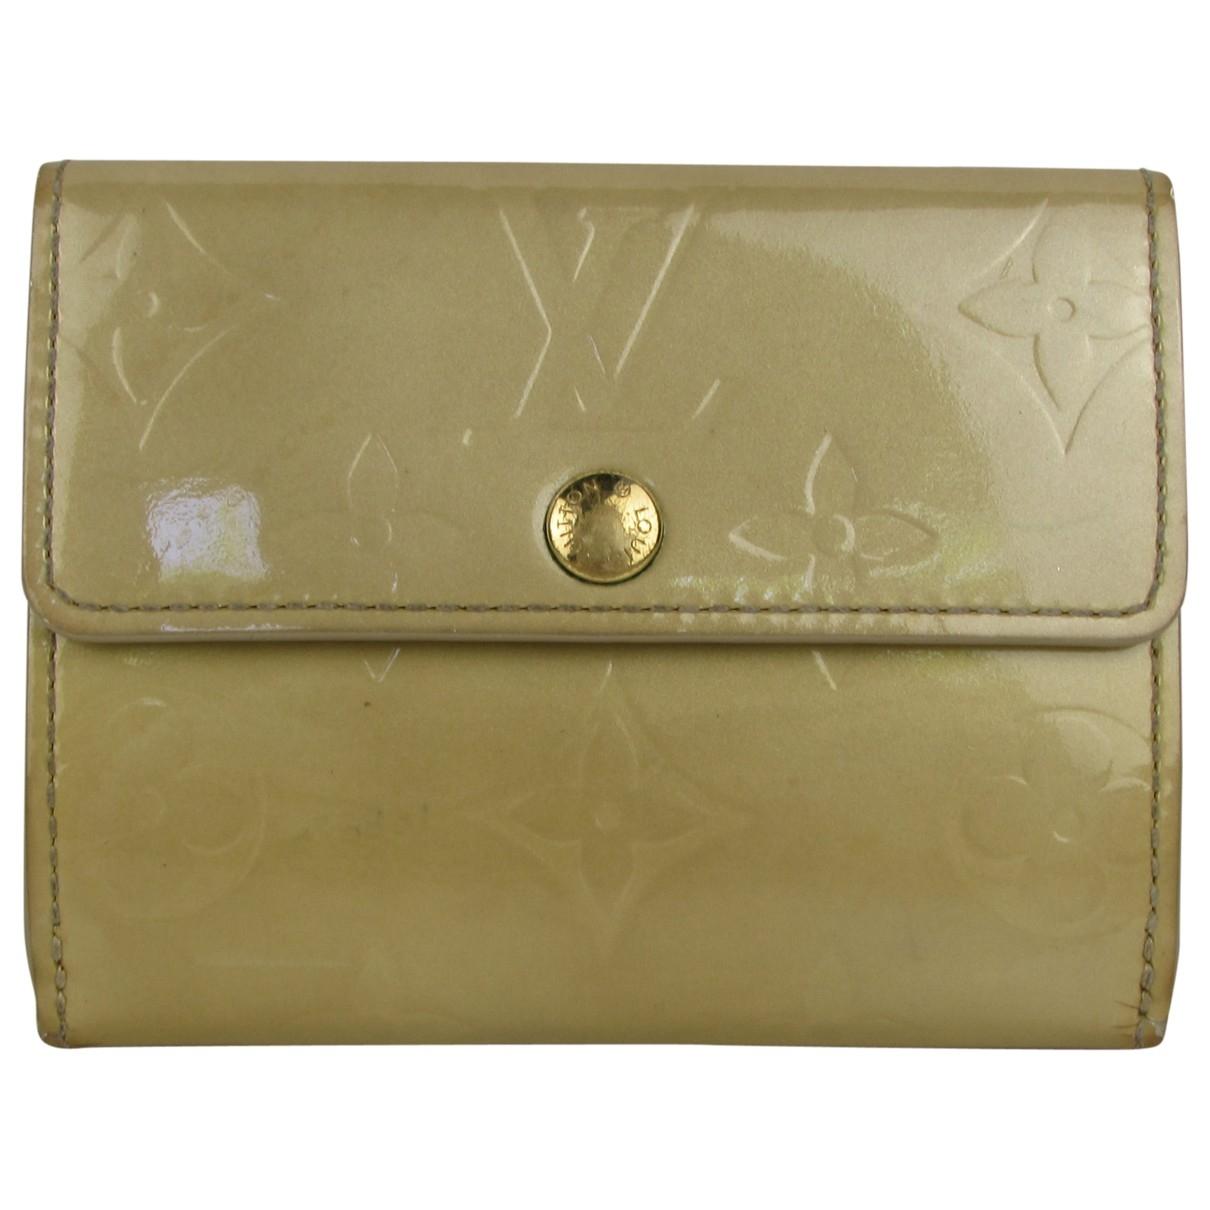 Louis Vuitton \N Beige Patent leather Purses, wallet & cases for Women \N